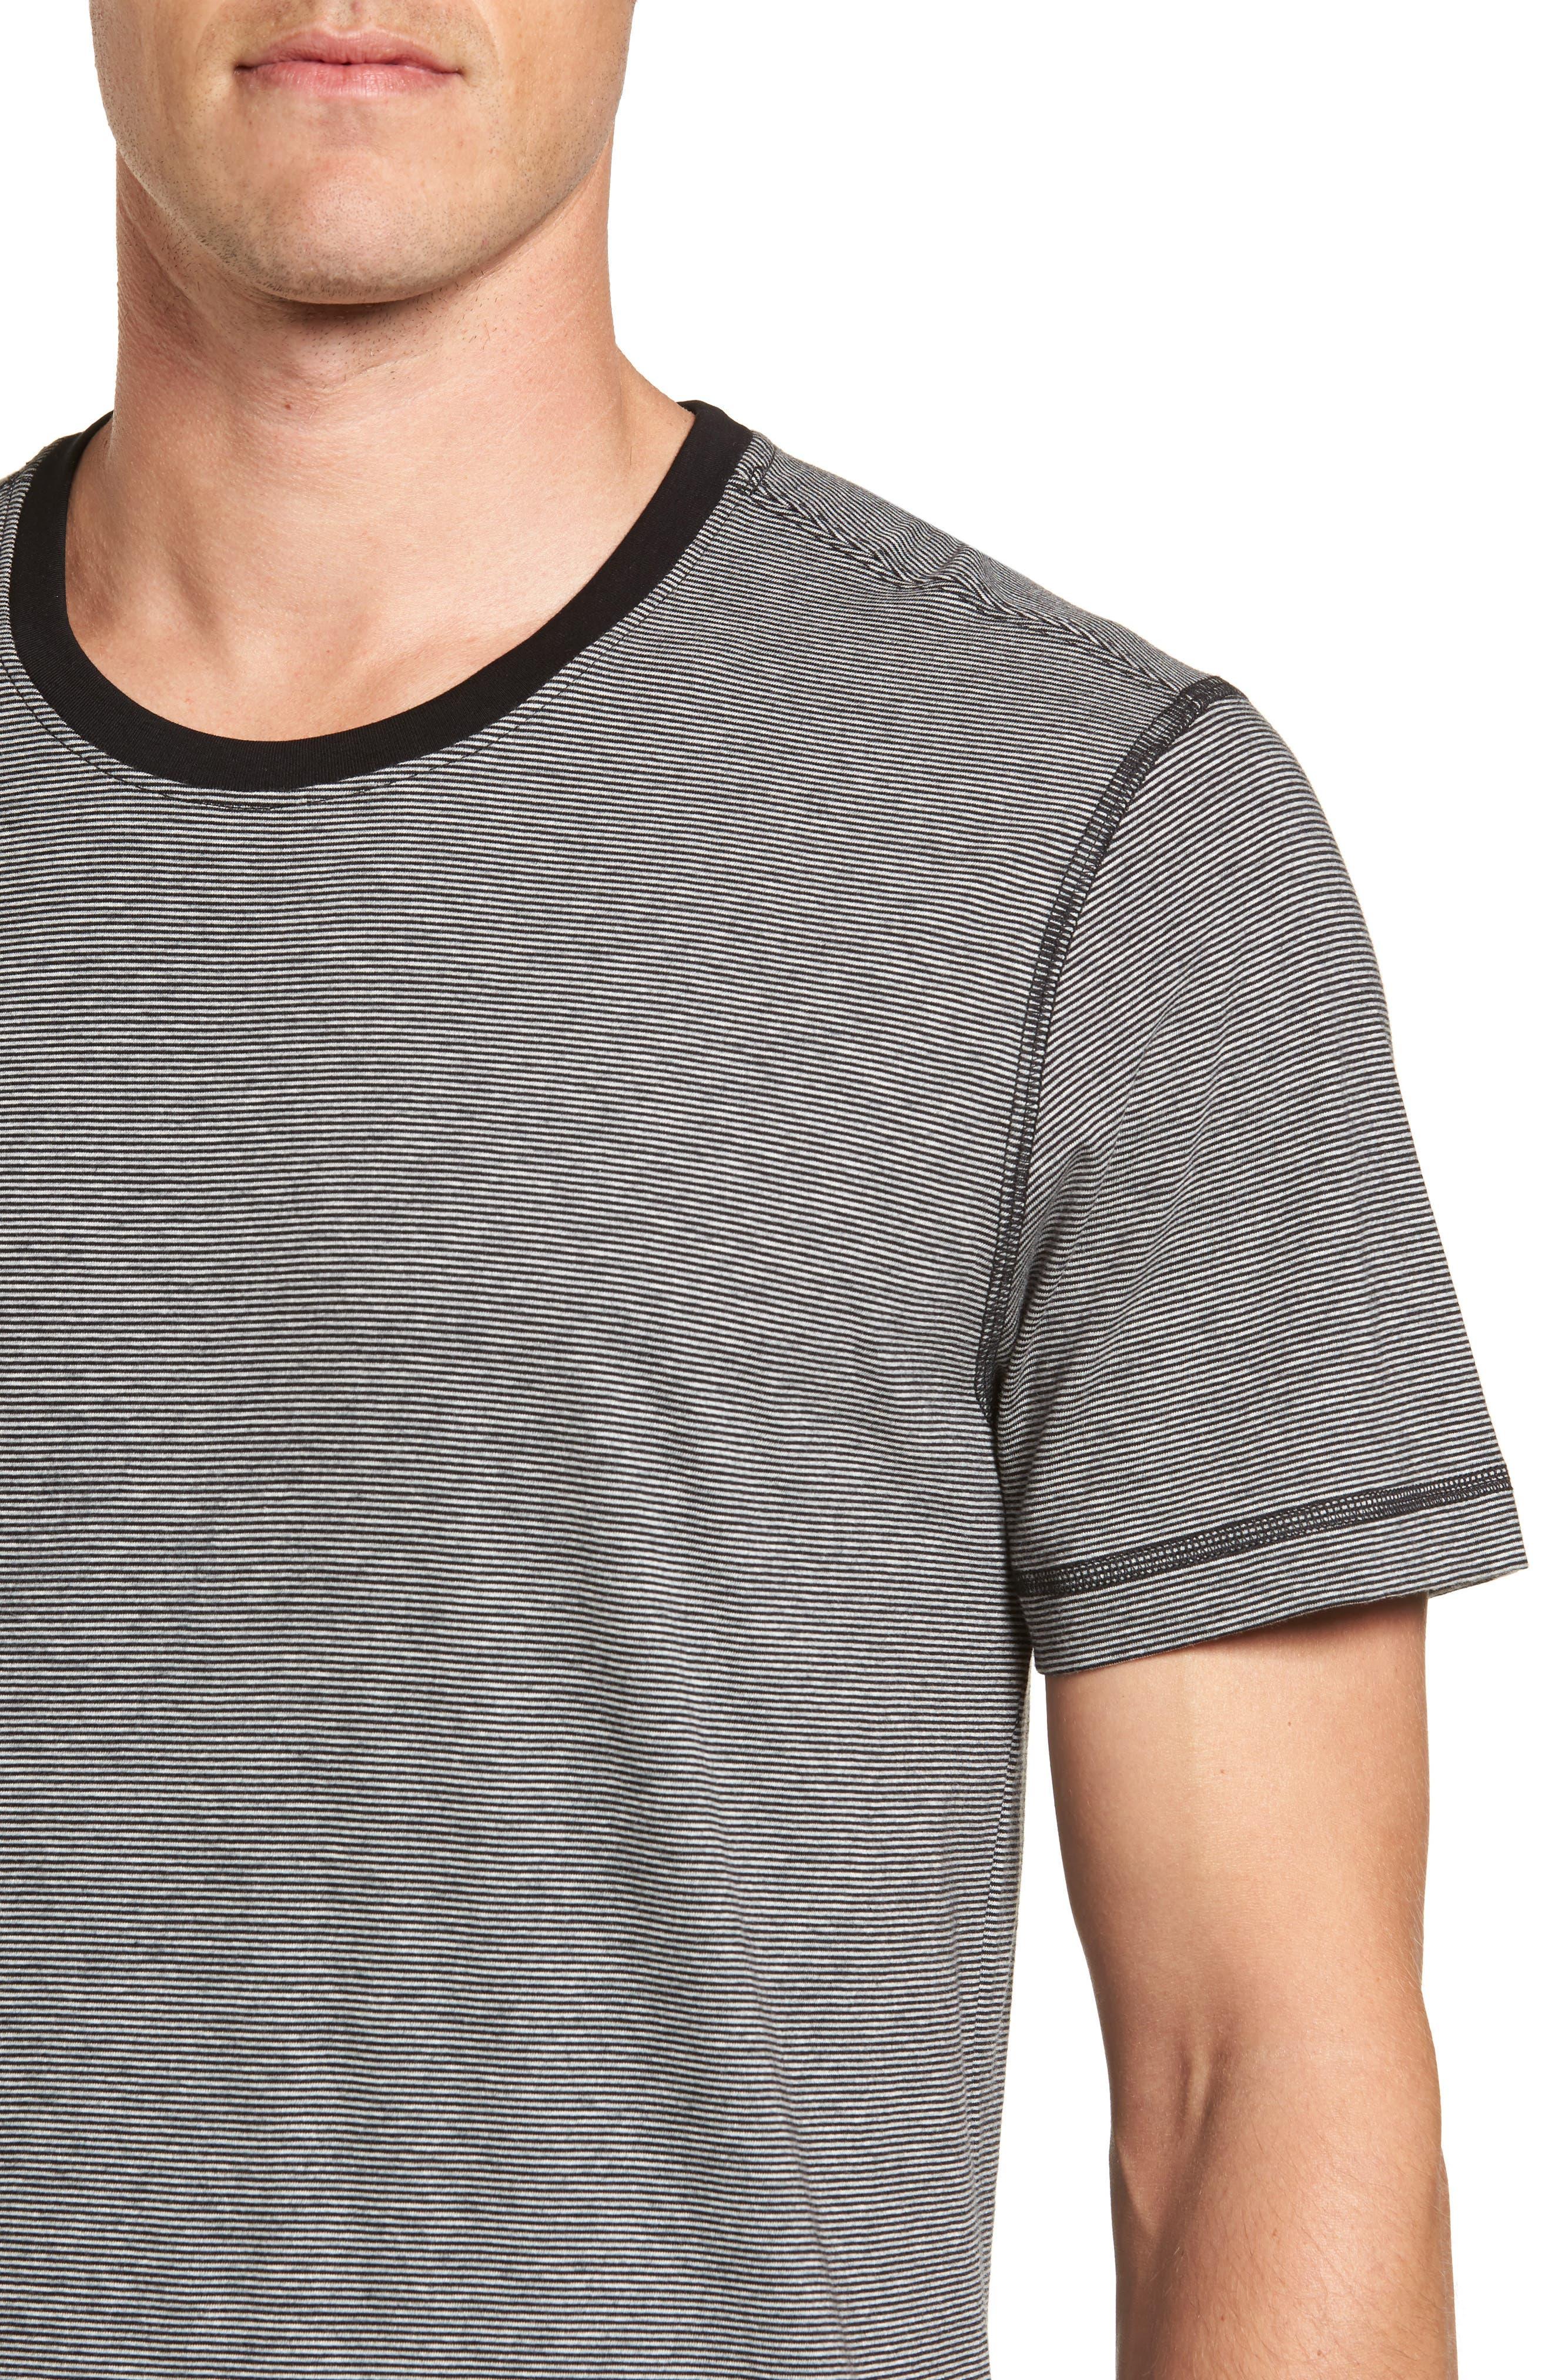 Peruvian Pima Cotton T-Shirt,                             Alternate thumbnail 4, color,                             Black/ Grey Heather